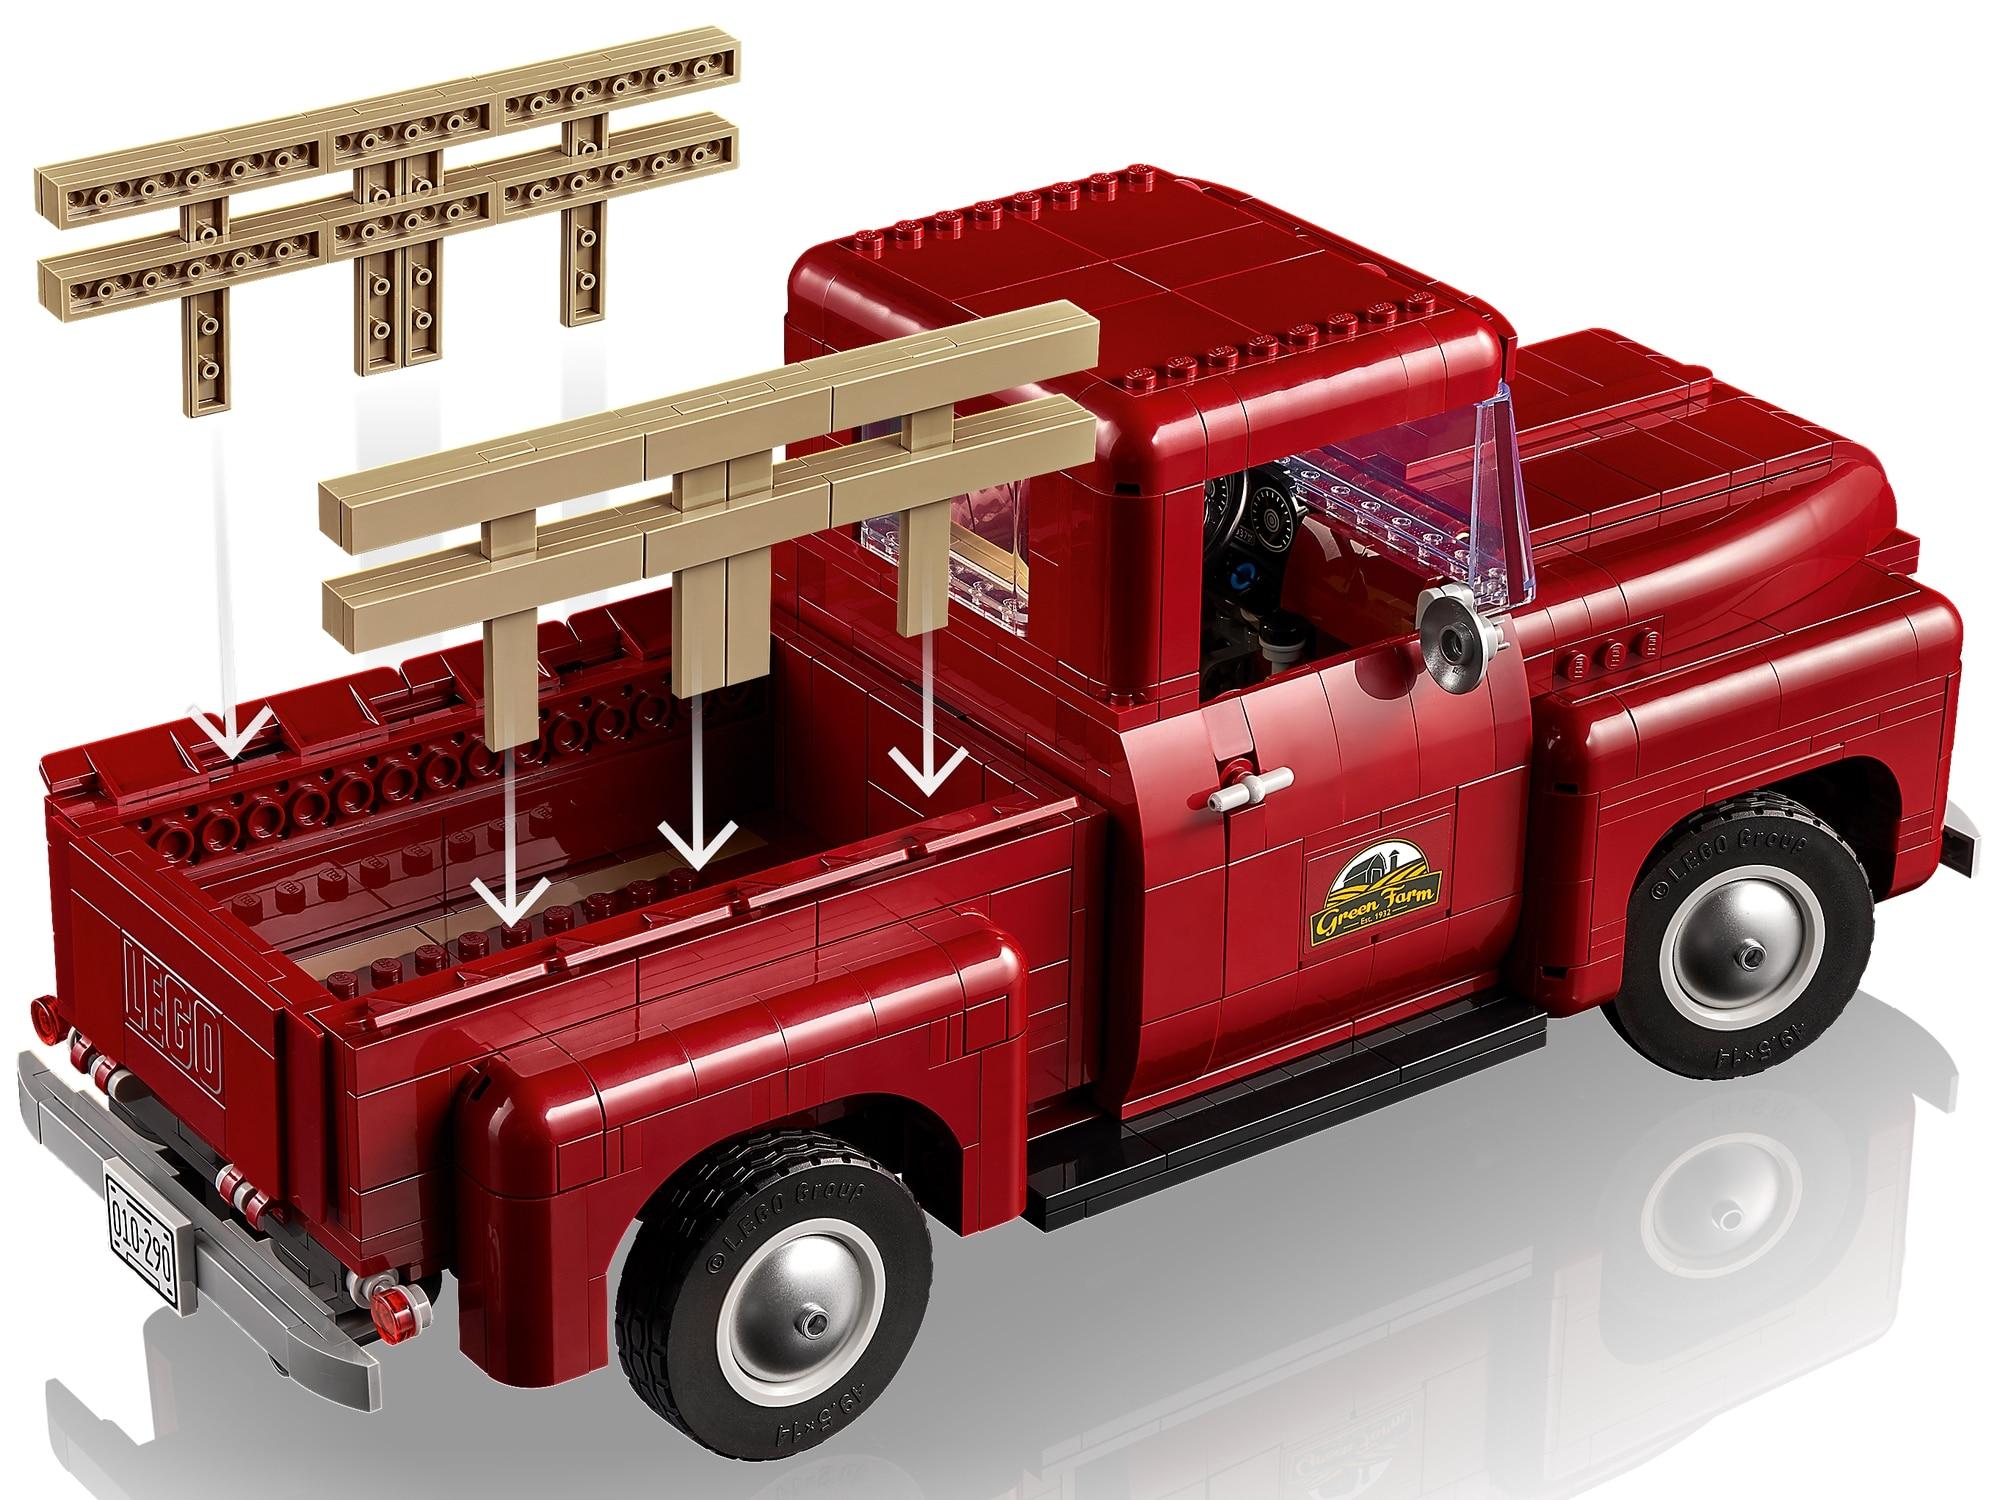 LEGO Creator Expert 10290 Pickup 8